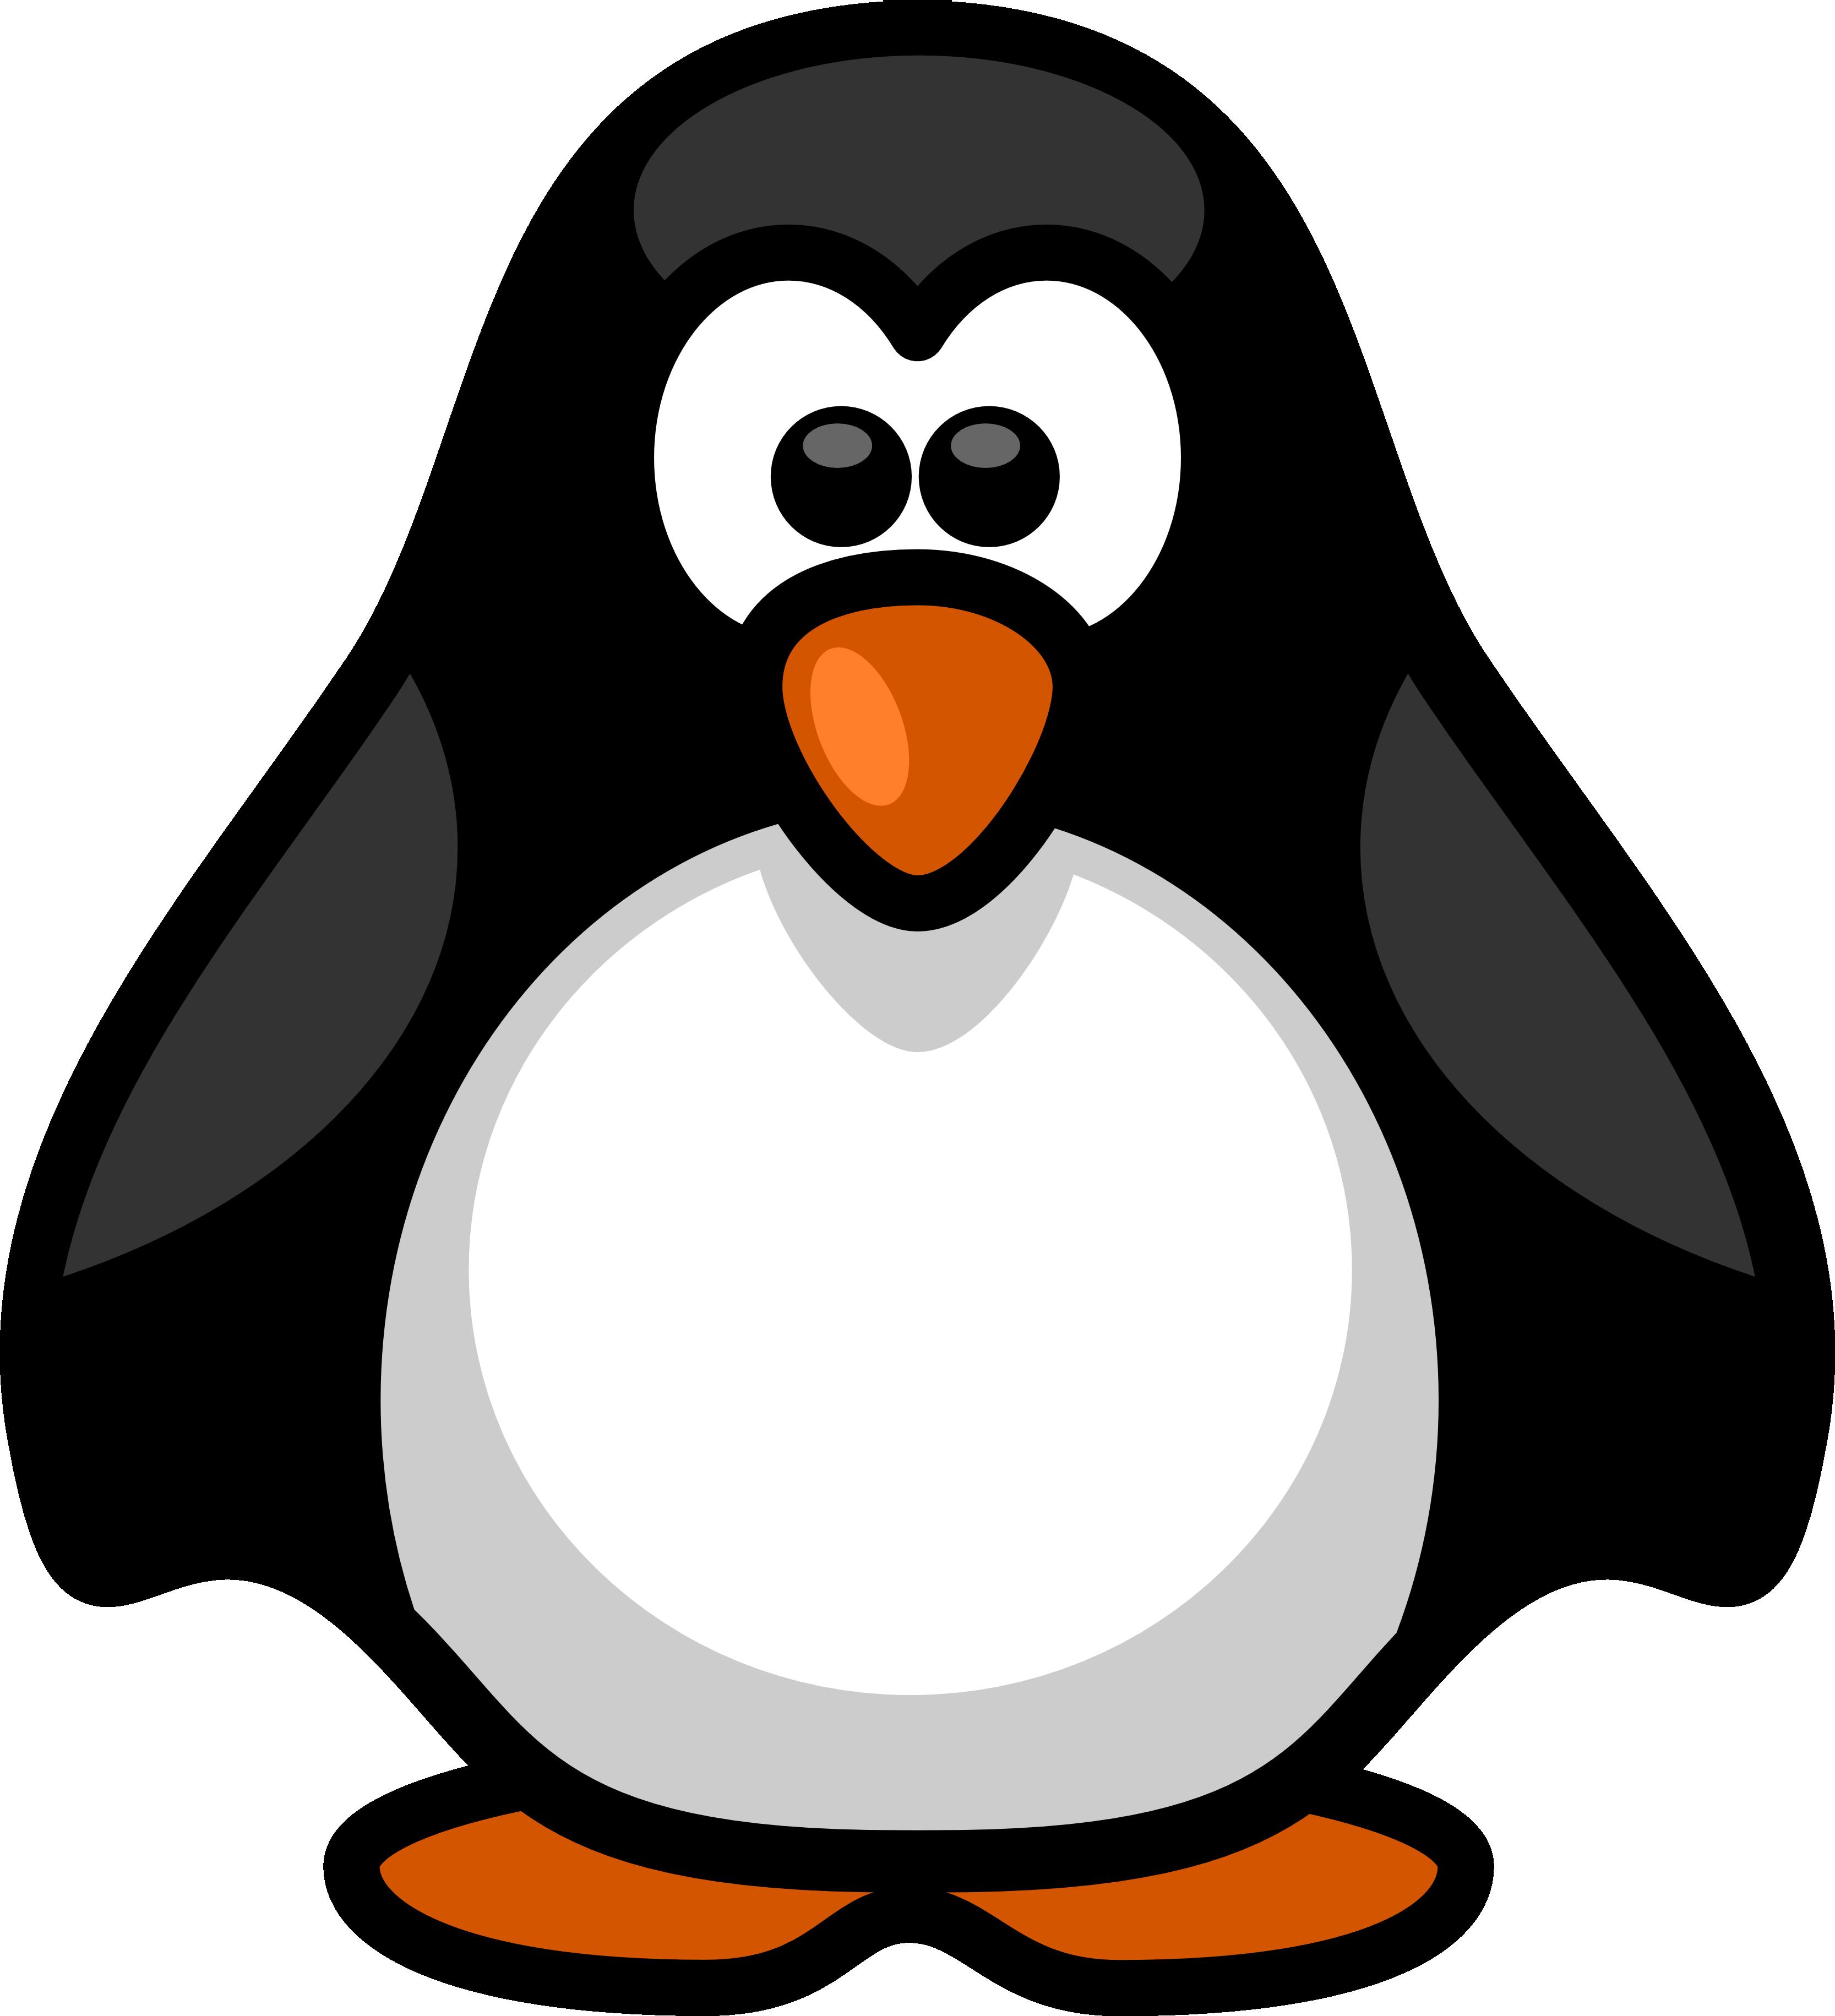 Penguin eating fish clipart vector download Penguin Clip Art Christmas | Clipart Panda - Free Clipart Images vector download